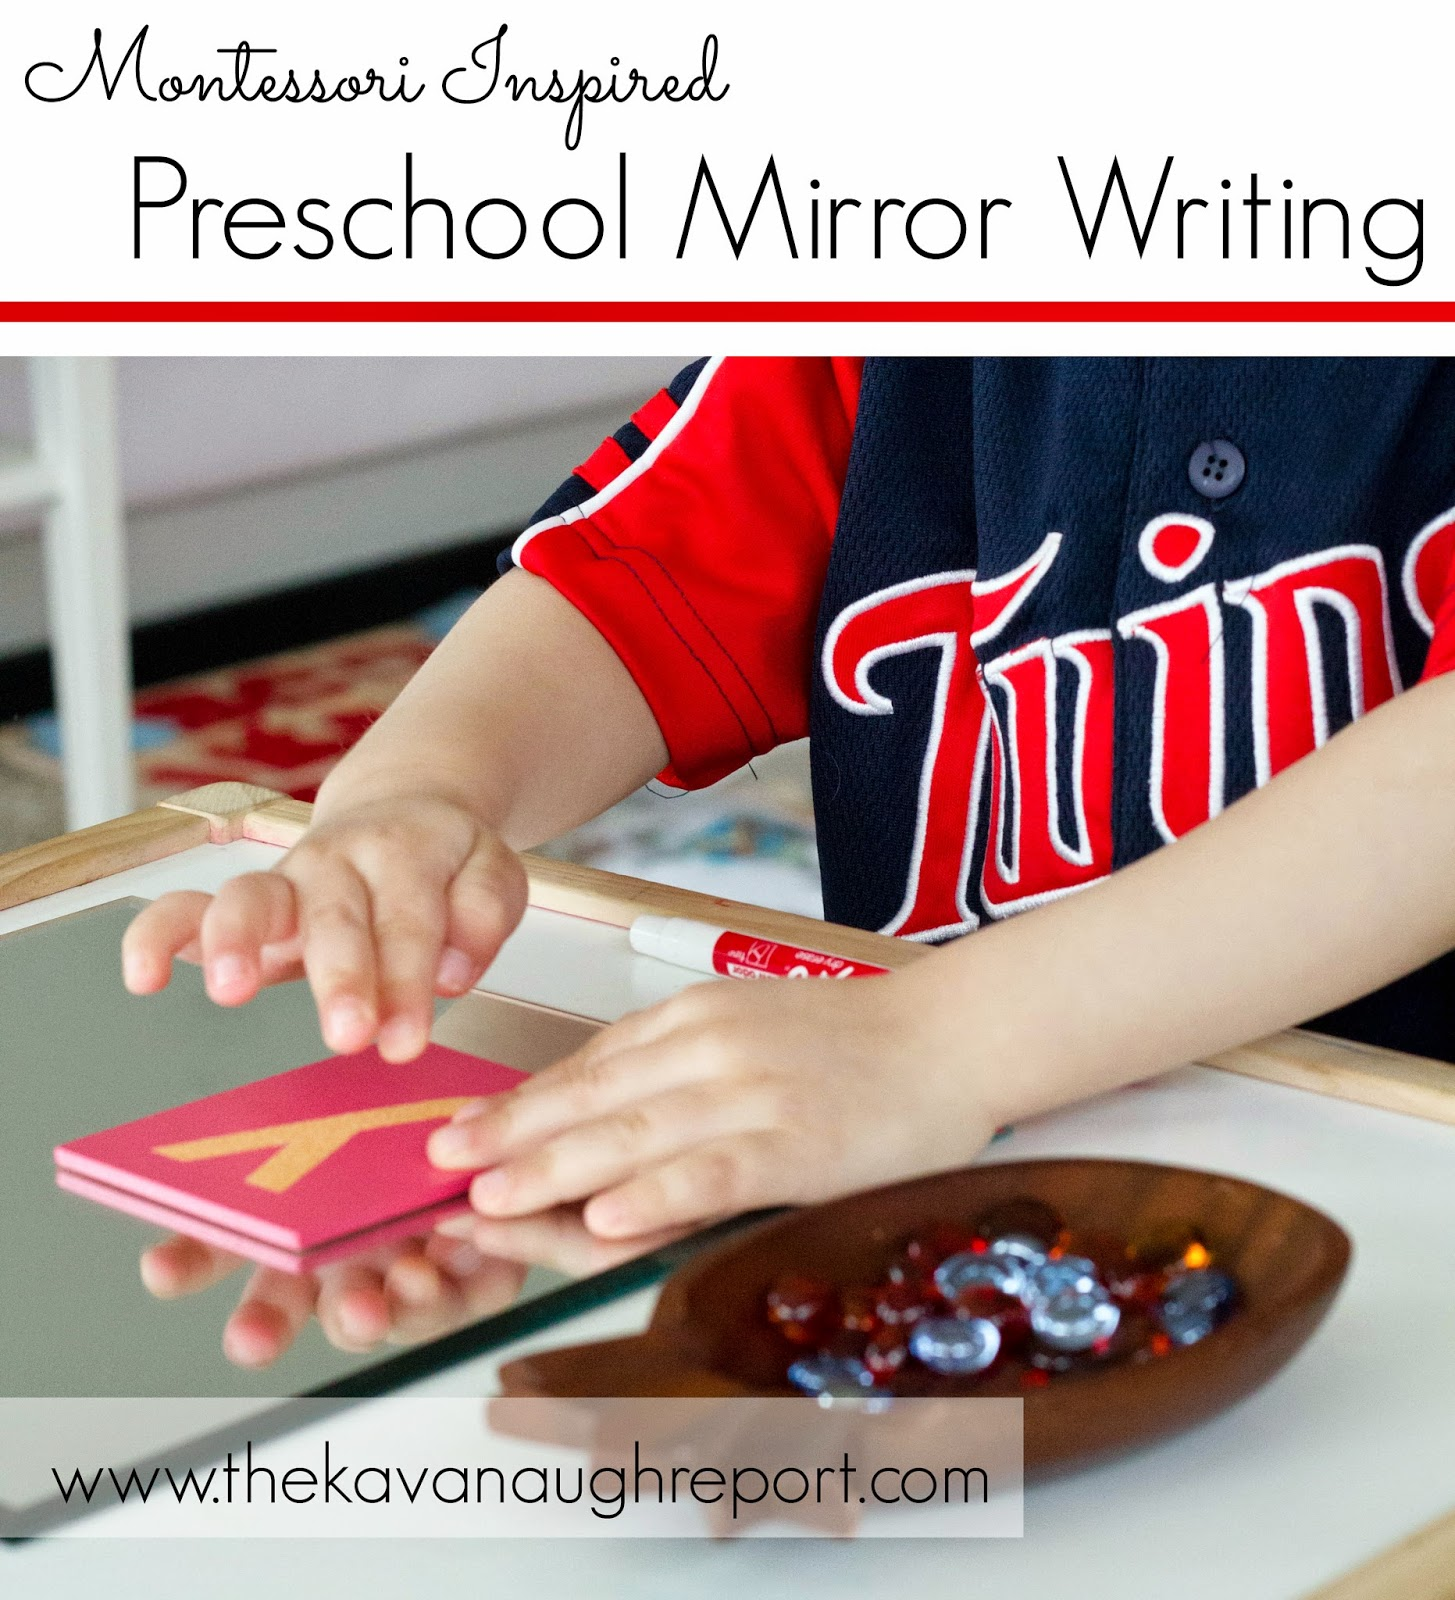 Montessori Inspired Preschool Mirror Writing